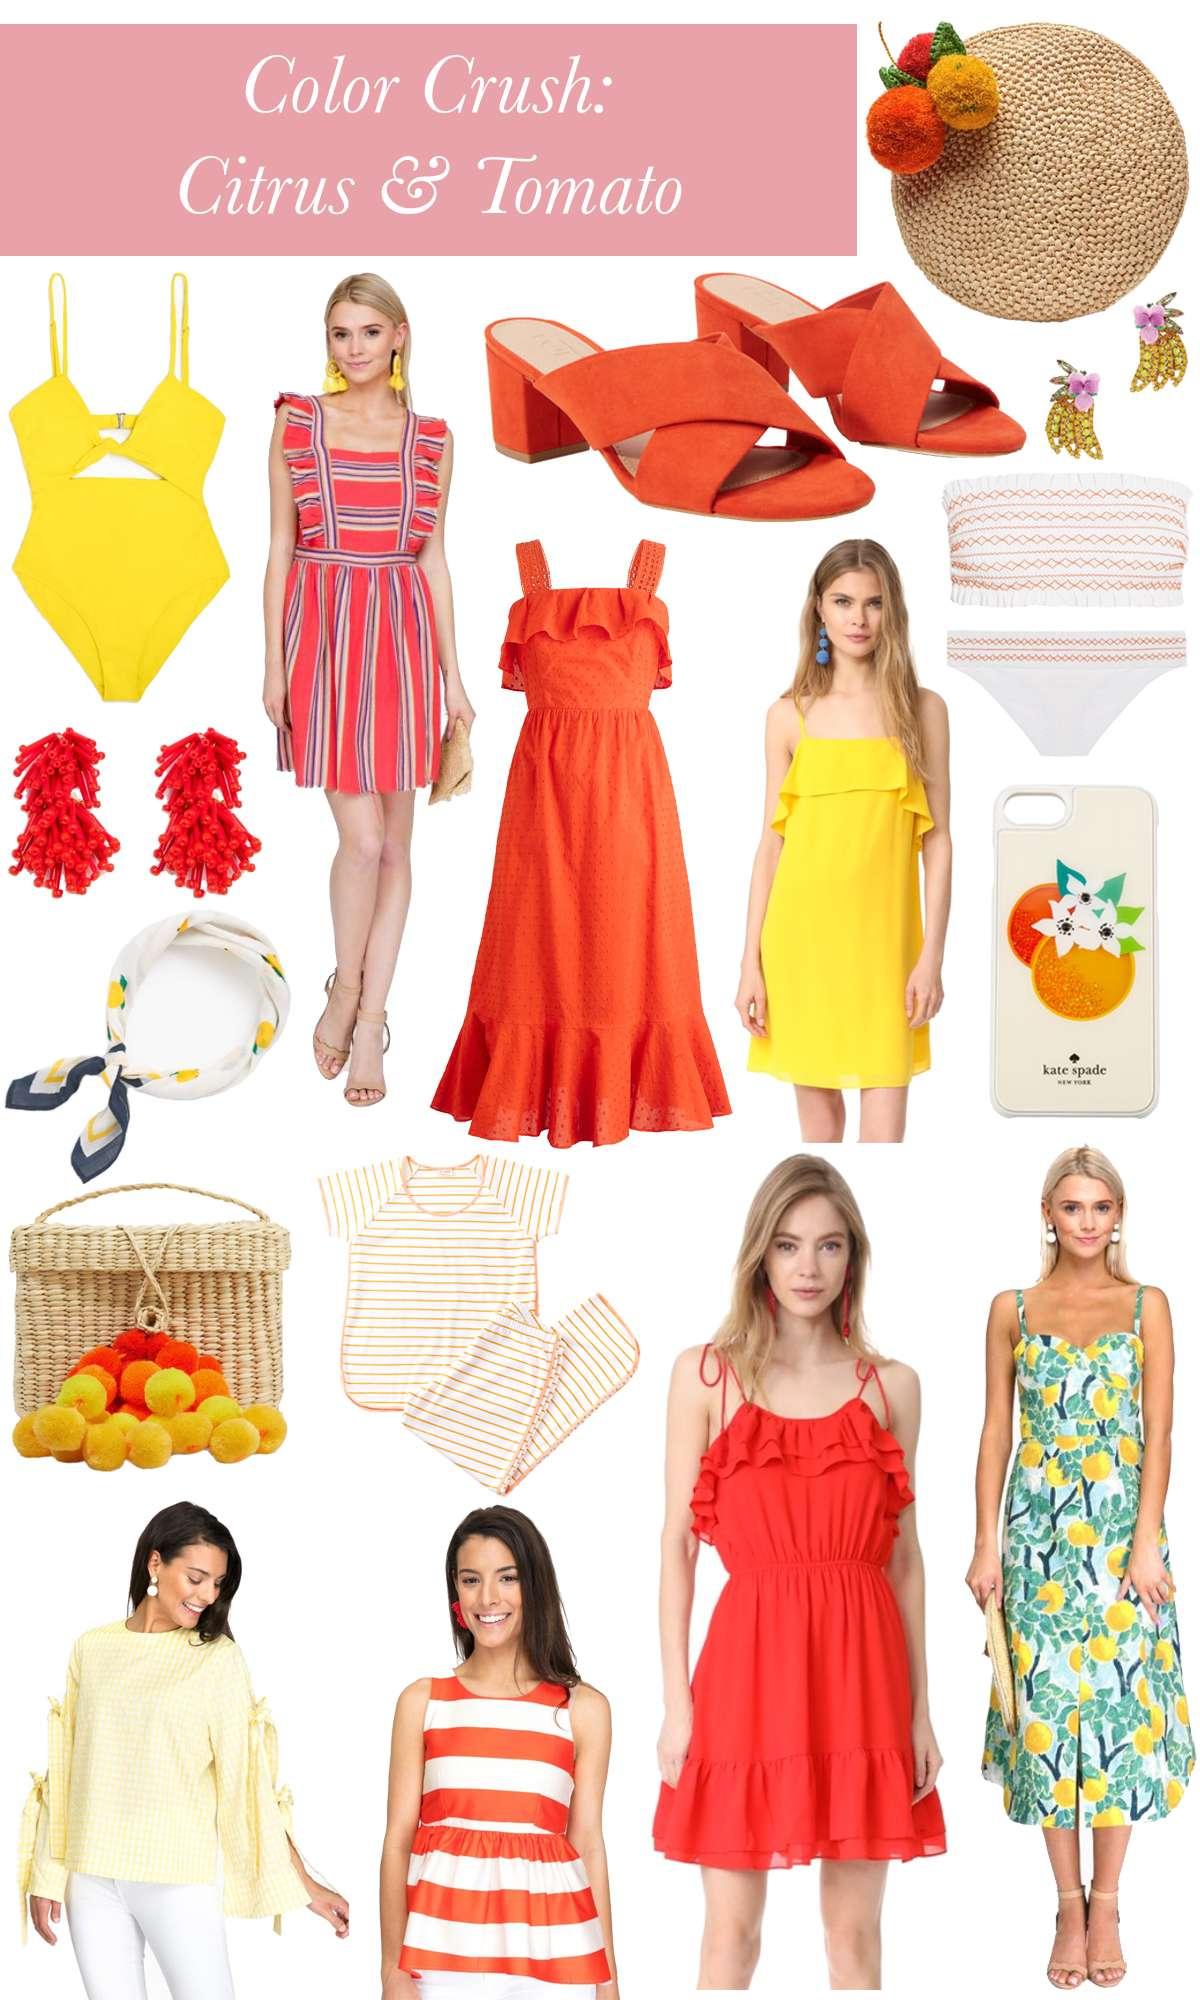 Color Crush: Citrus & Tomato on Rhyme & Reason